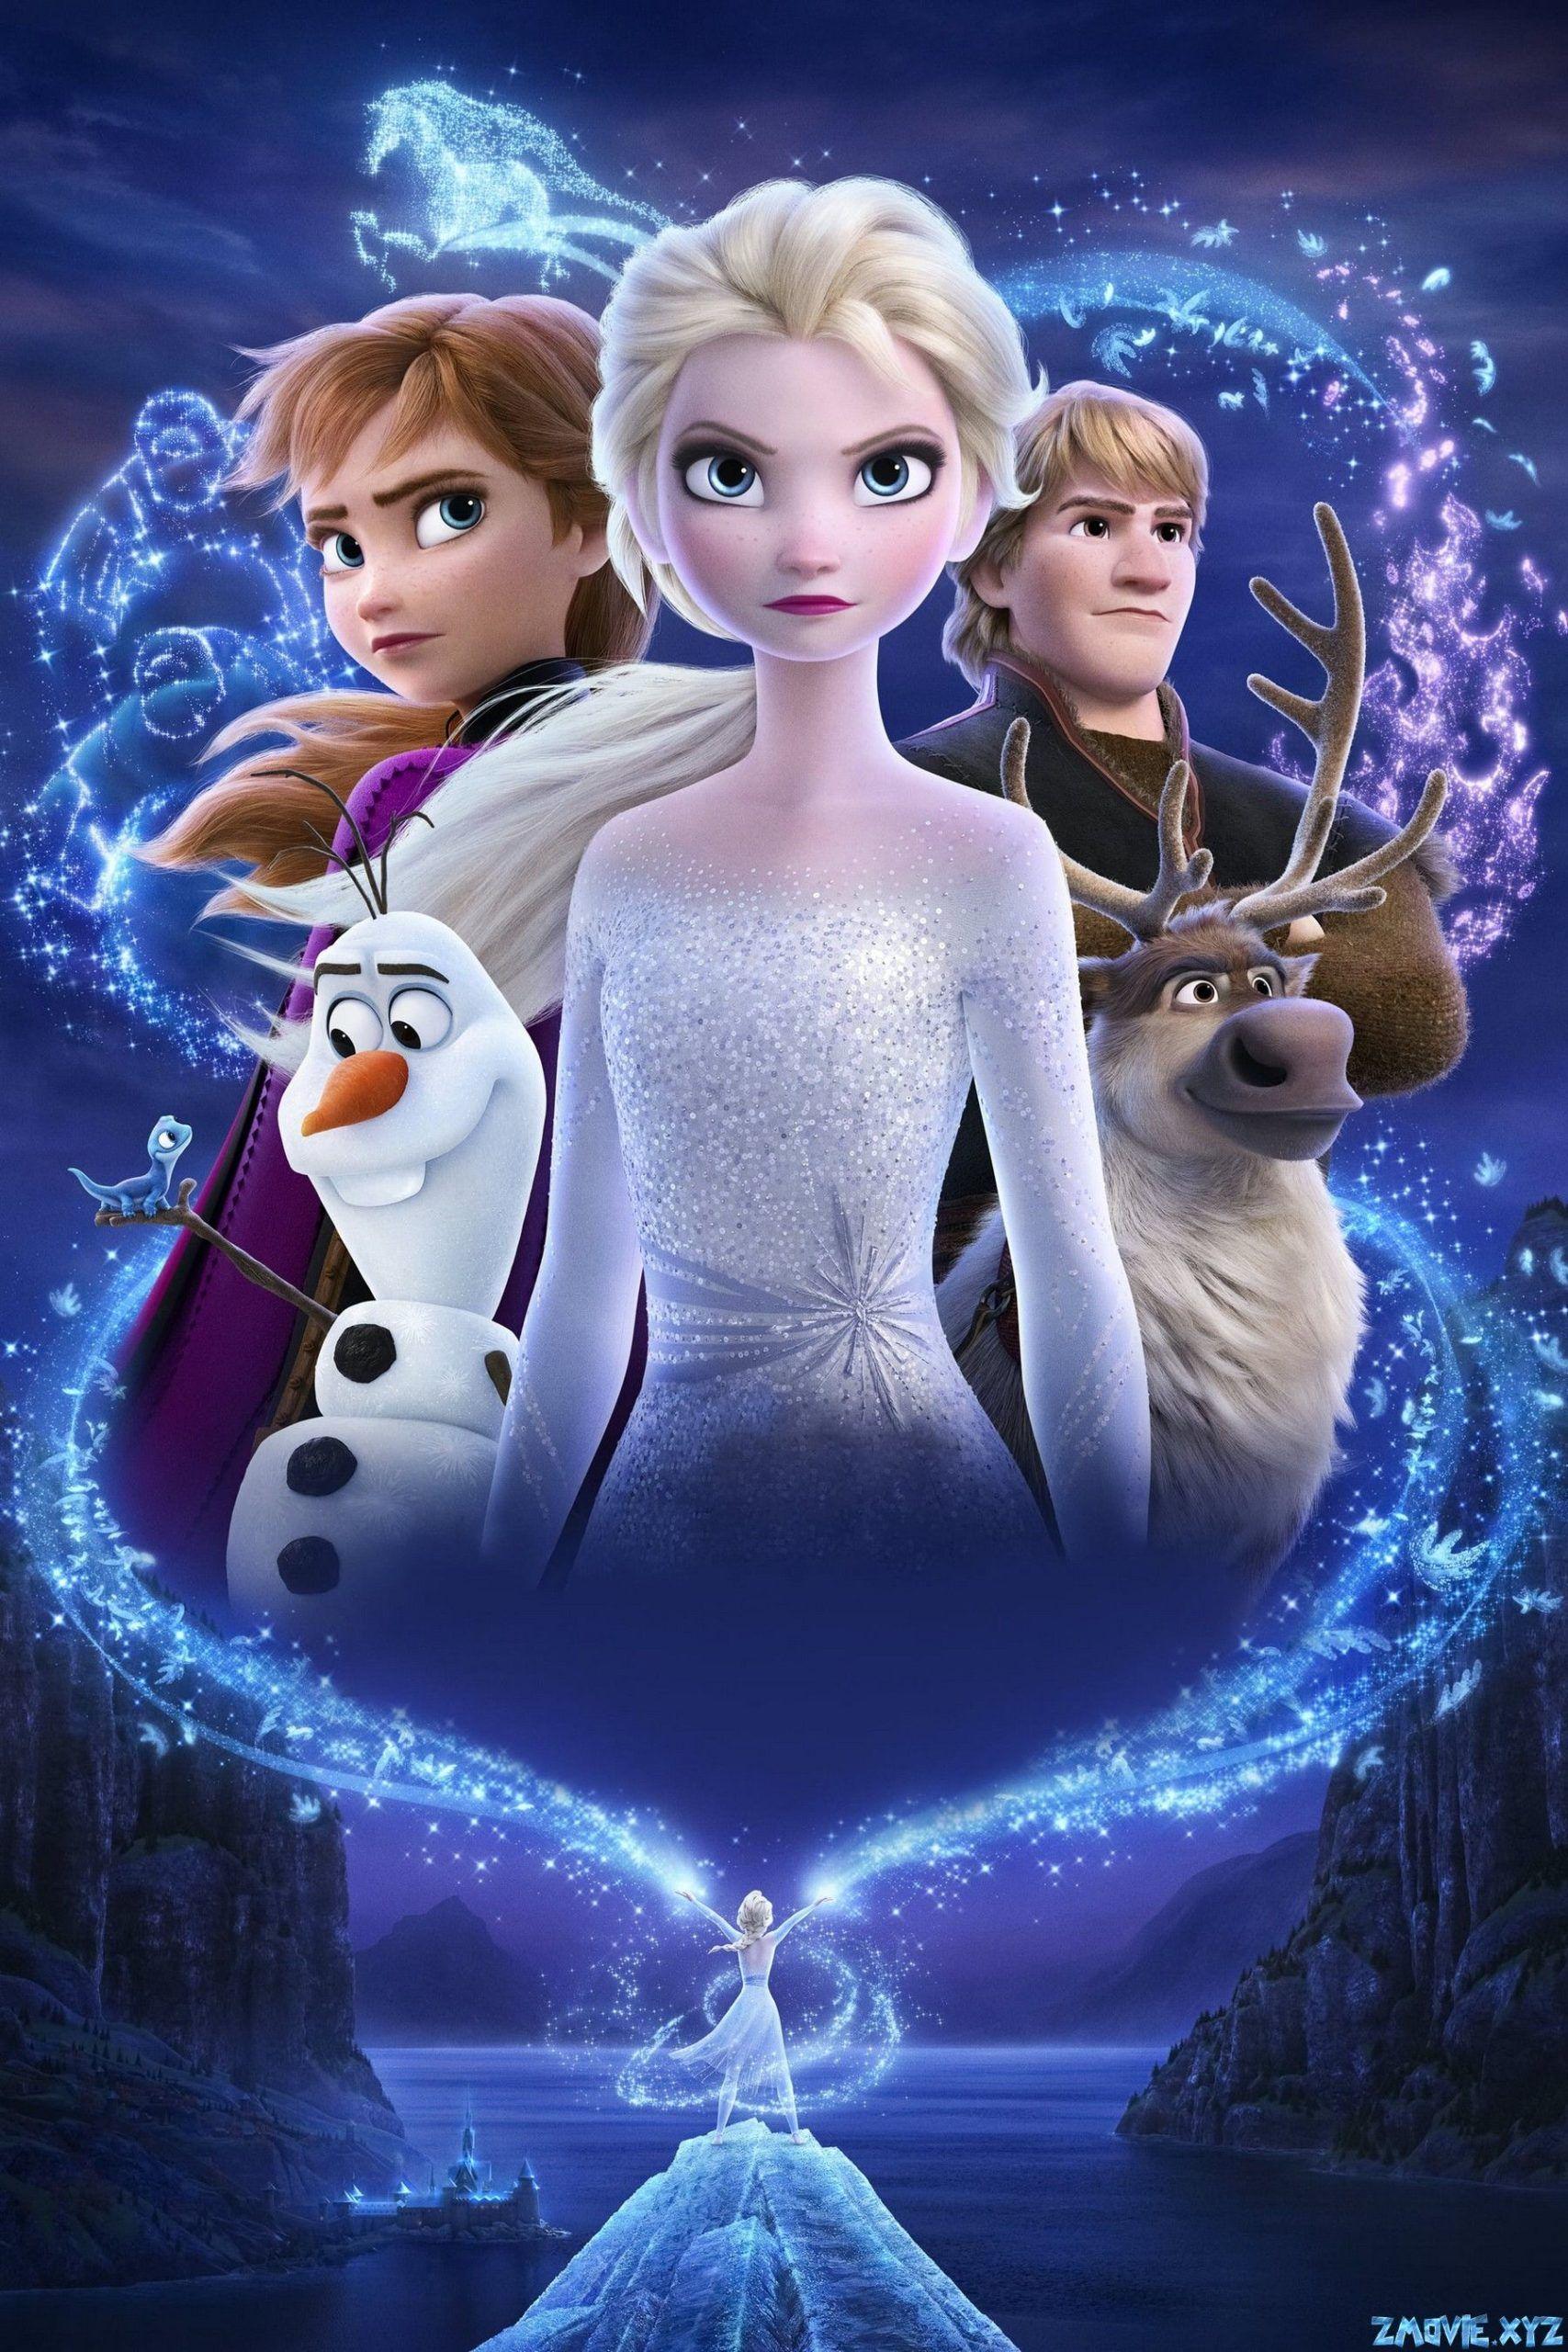 Frozen 2 En Espanol Latino Hd Subtitulado Actionmovie Frozen Disney Movie Disney Frozen Elsa Art Disney Princess Frozen